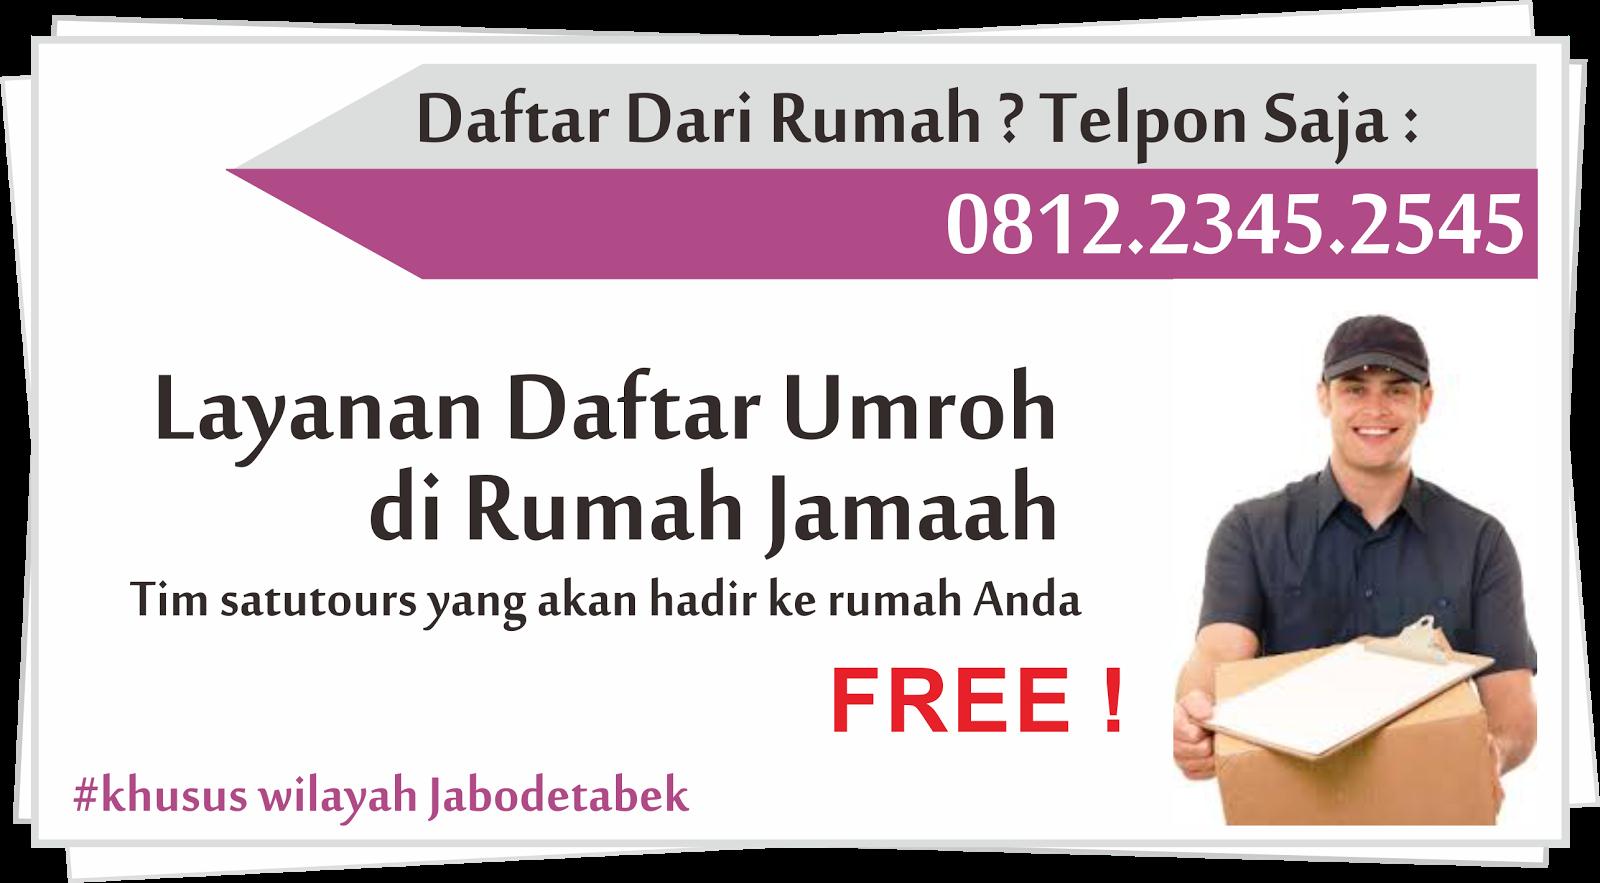 Layanan Jemput Jamaah :